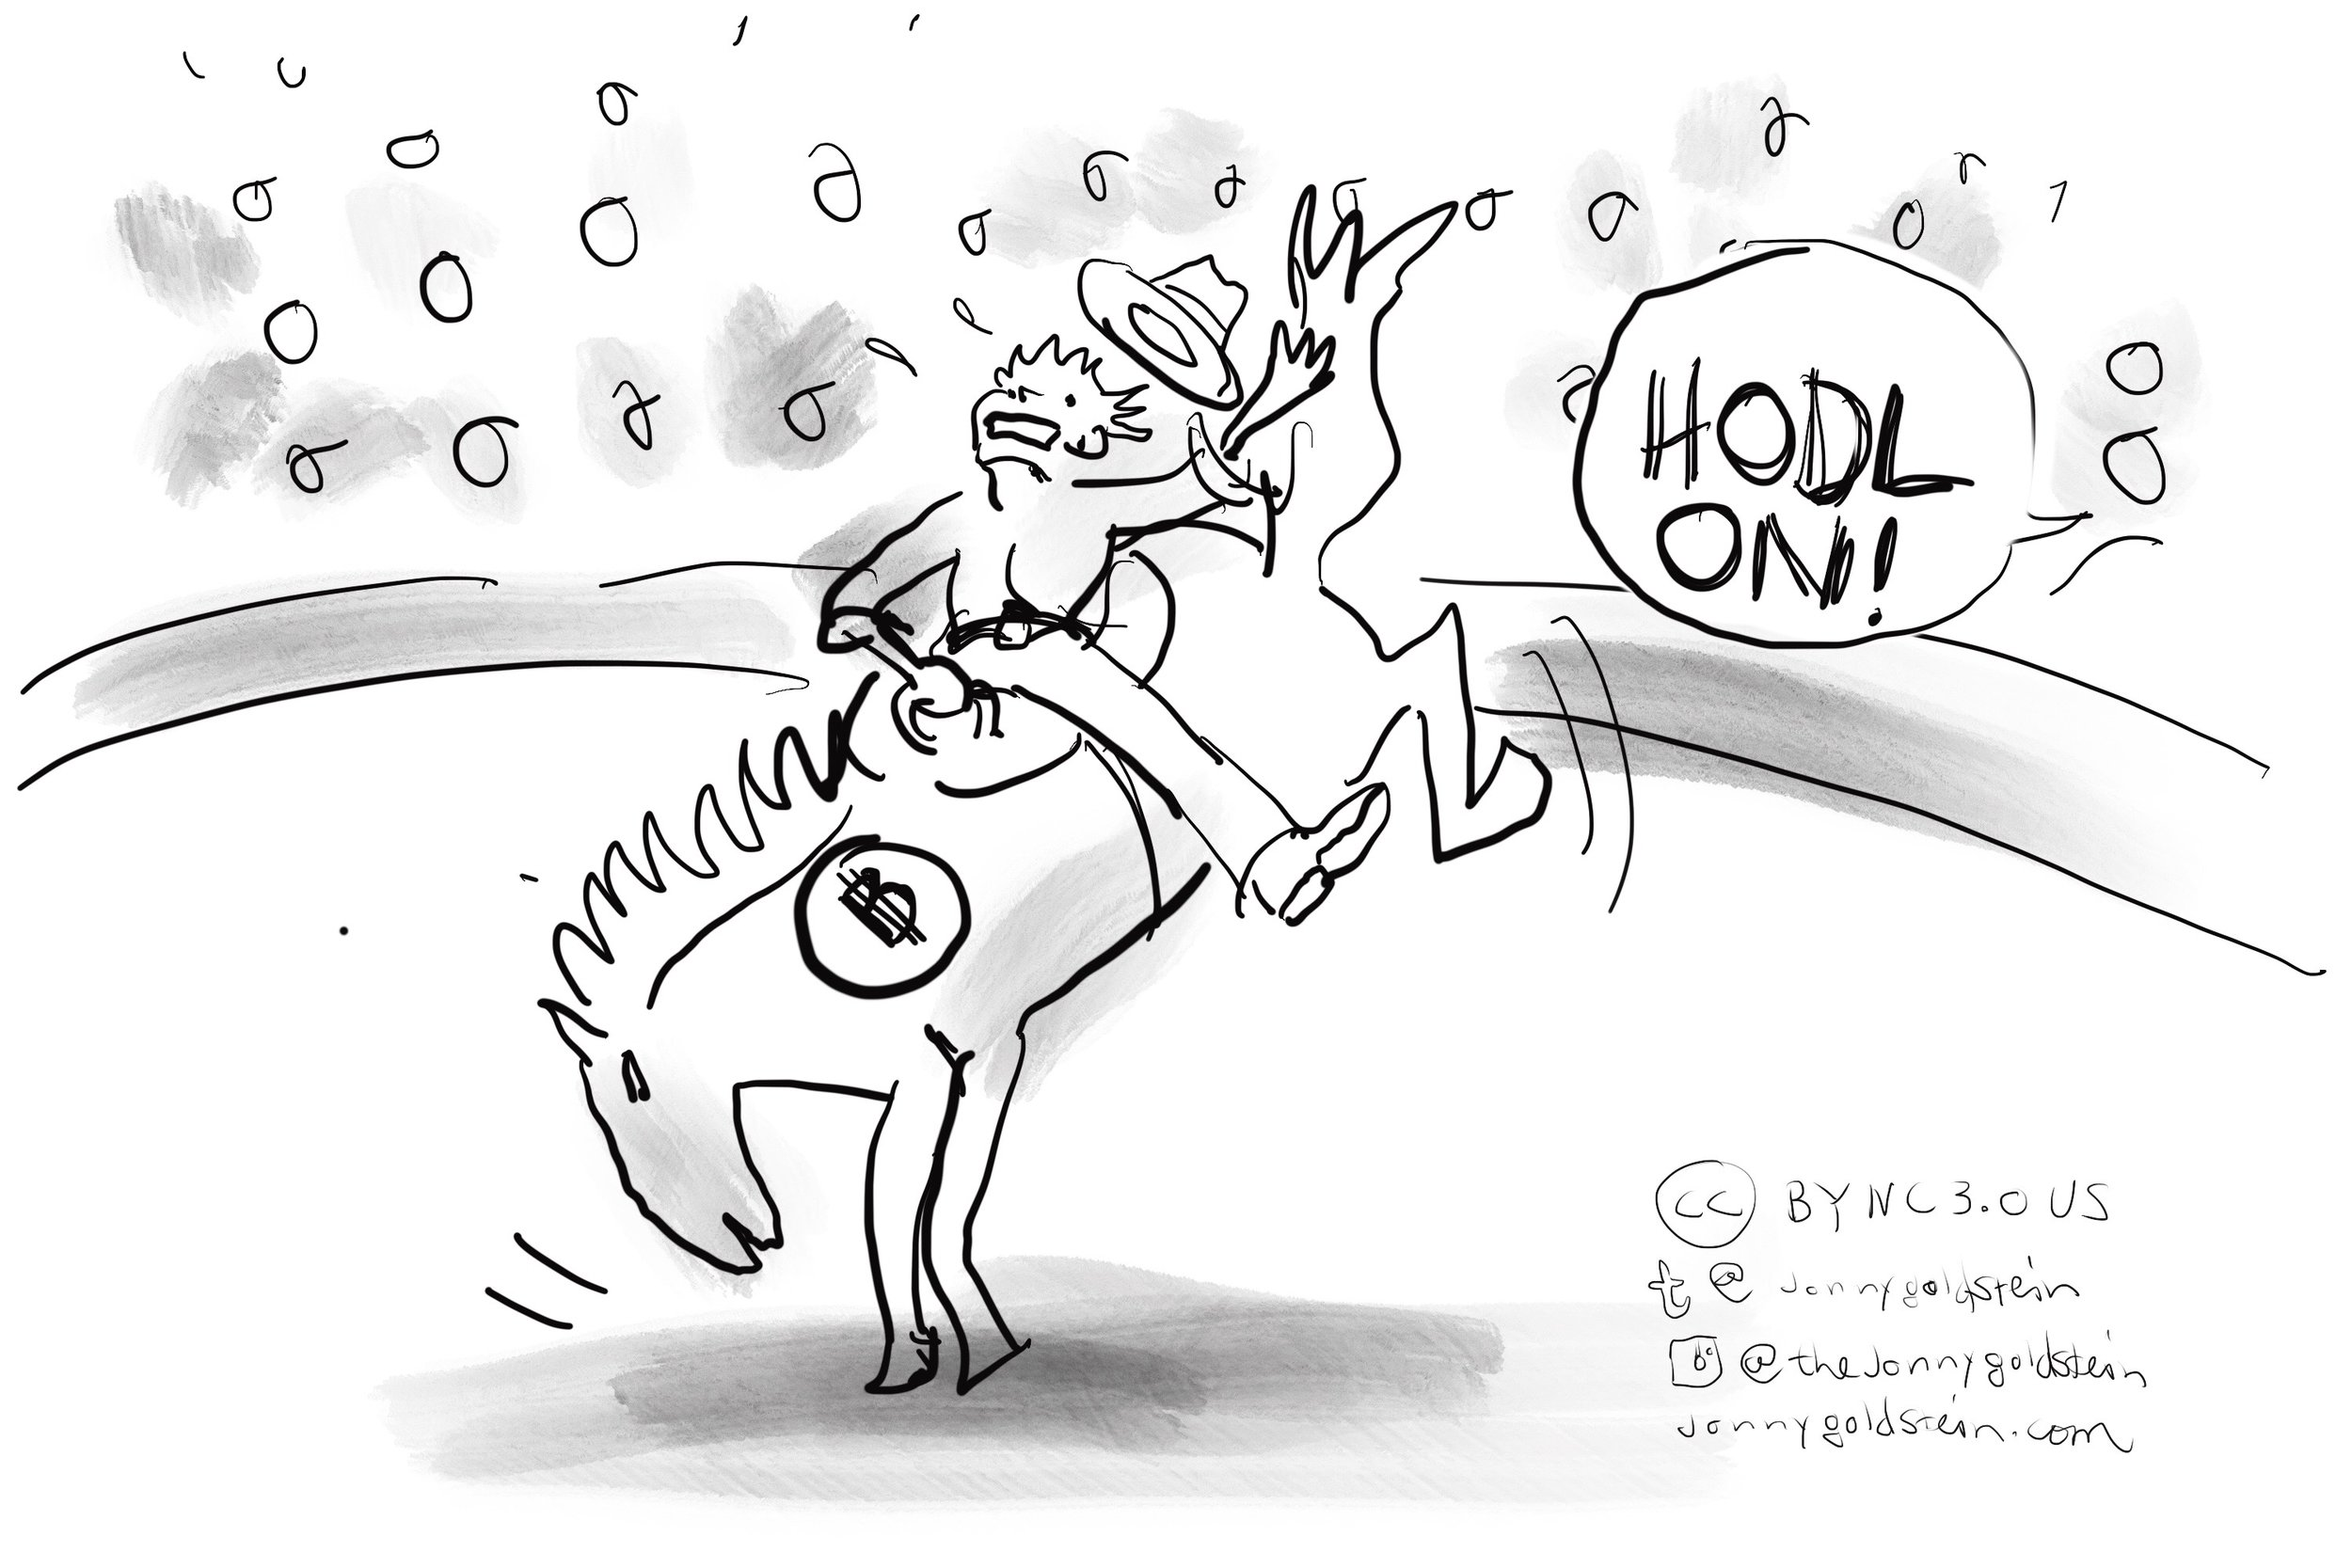 hodl-on-bitcoin-jonny-goldstein.JPG